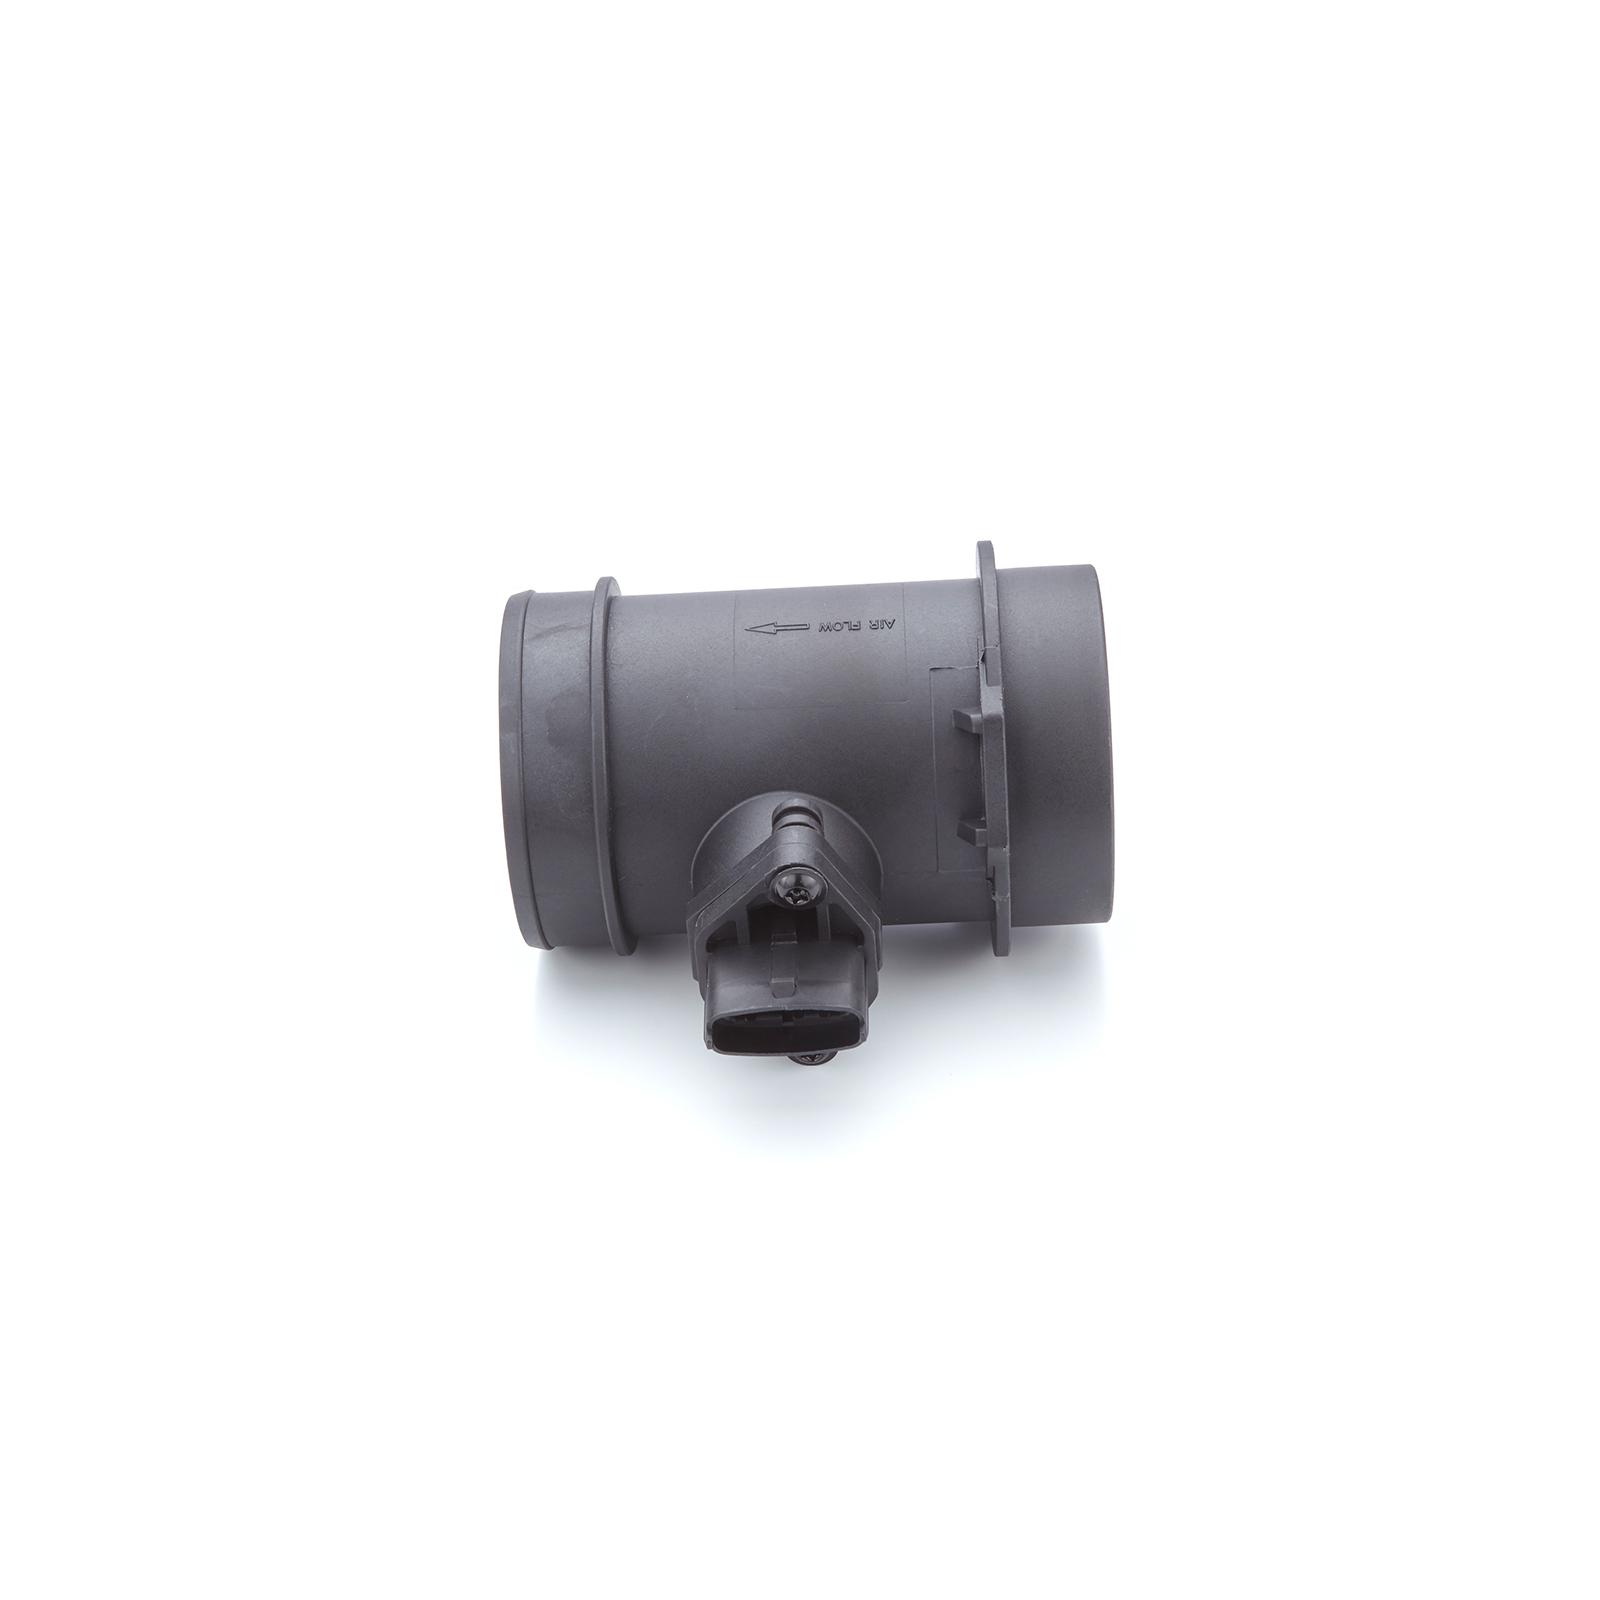 Mass-Air-Flow-Meter-Sensor-For-Honda-MG-Rover-Ferrari Indexbild 9